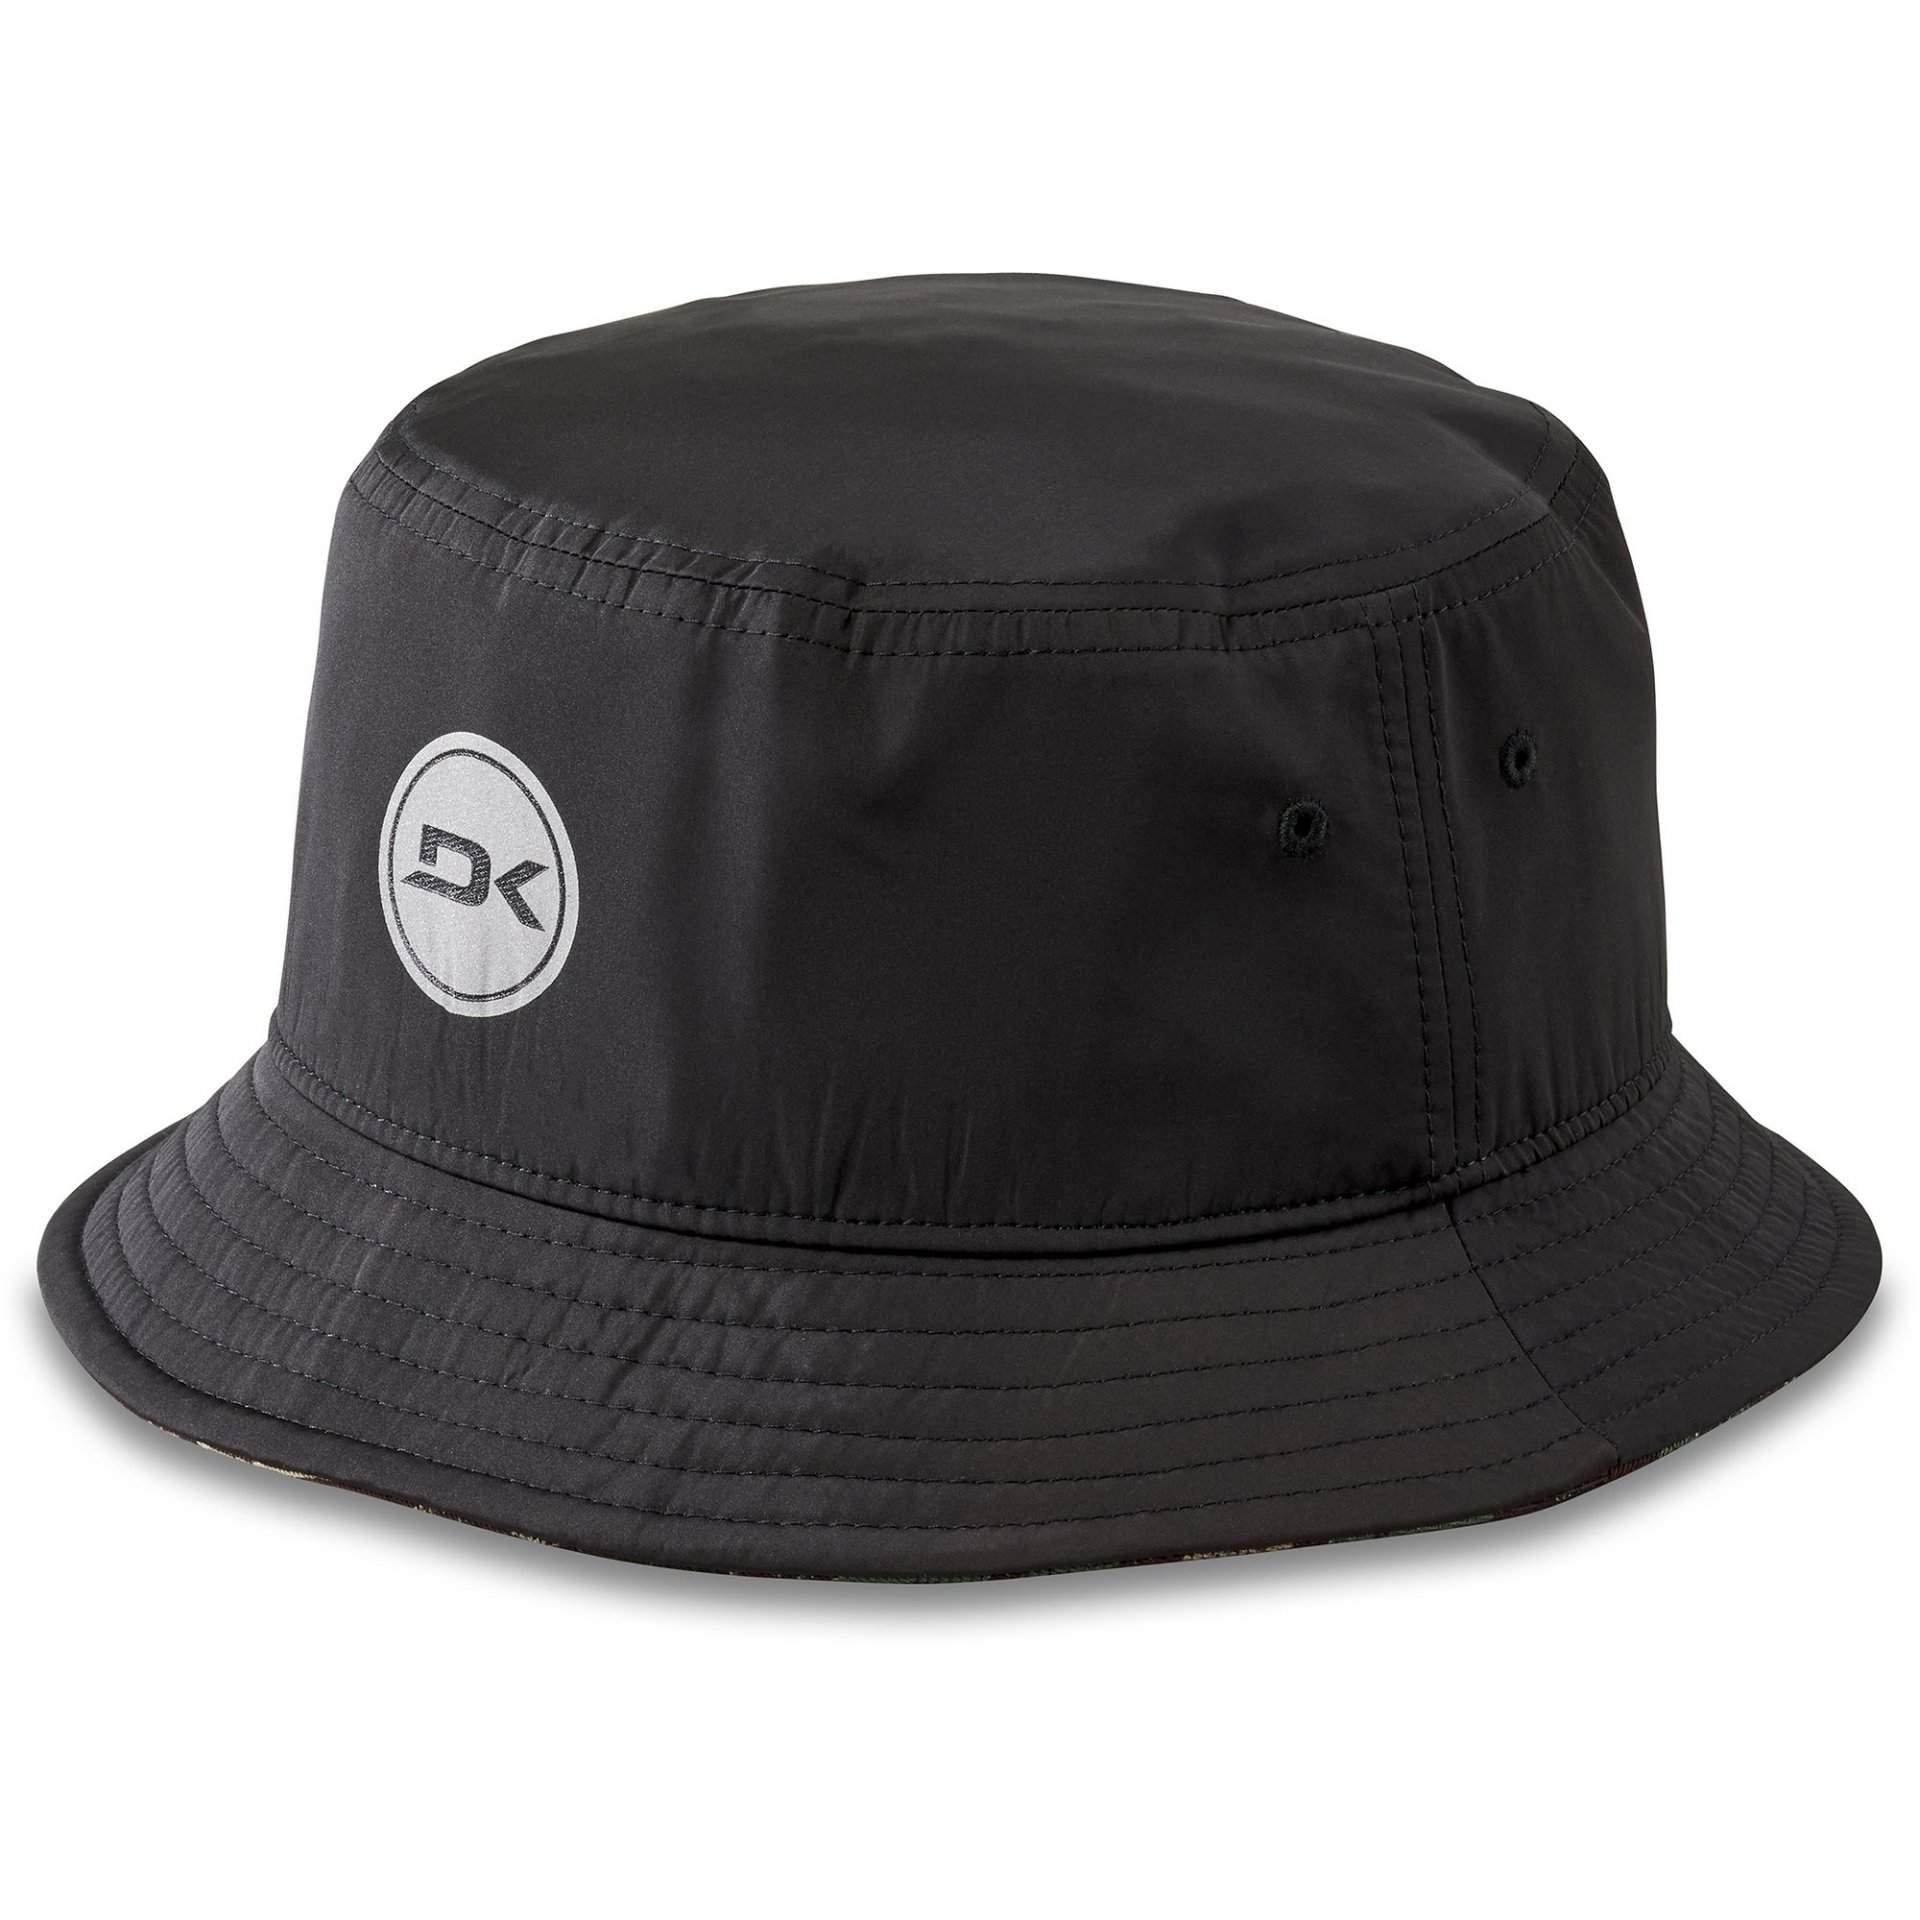 KAPELUSZ DAKINE OPTION REVERSIBLE BUCKET HAT BLACK ALOHA CAMO 1